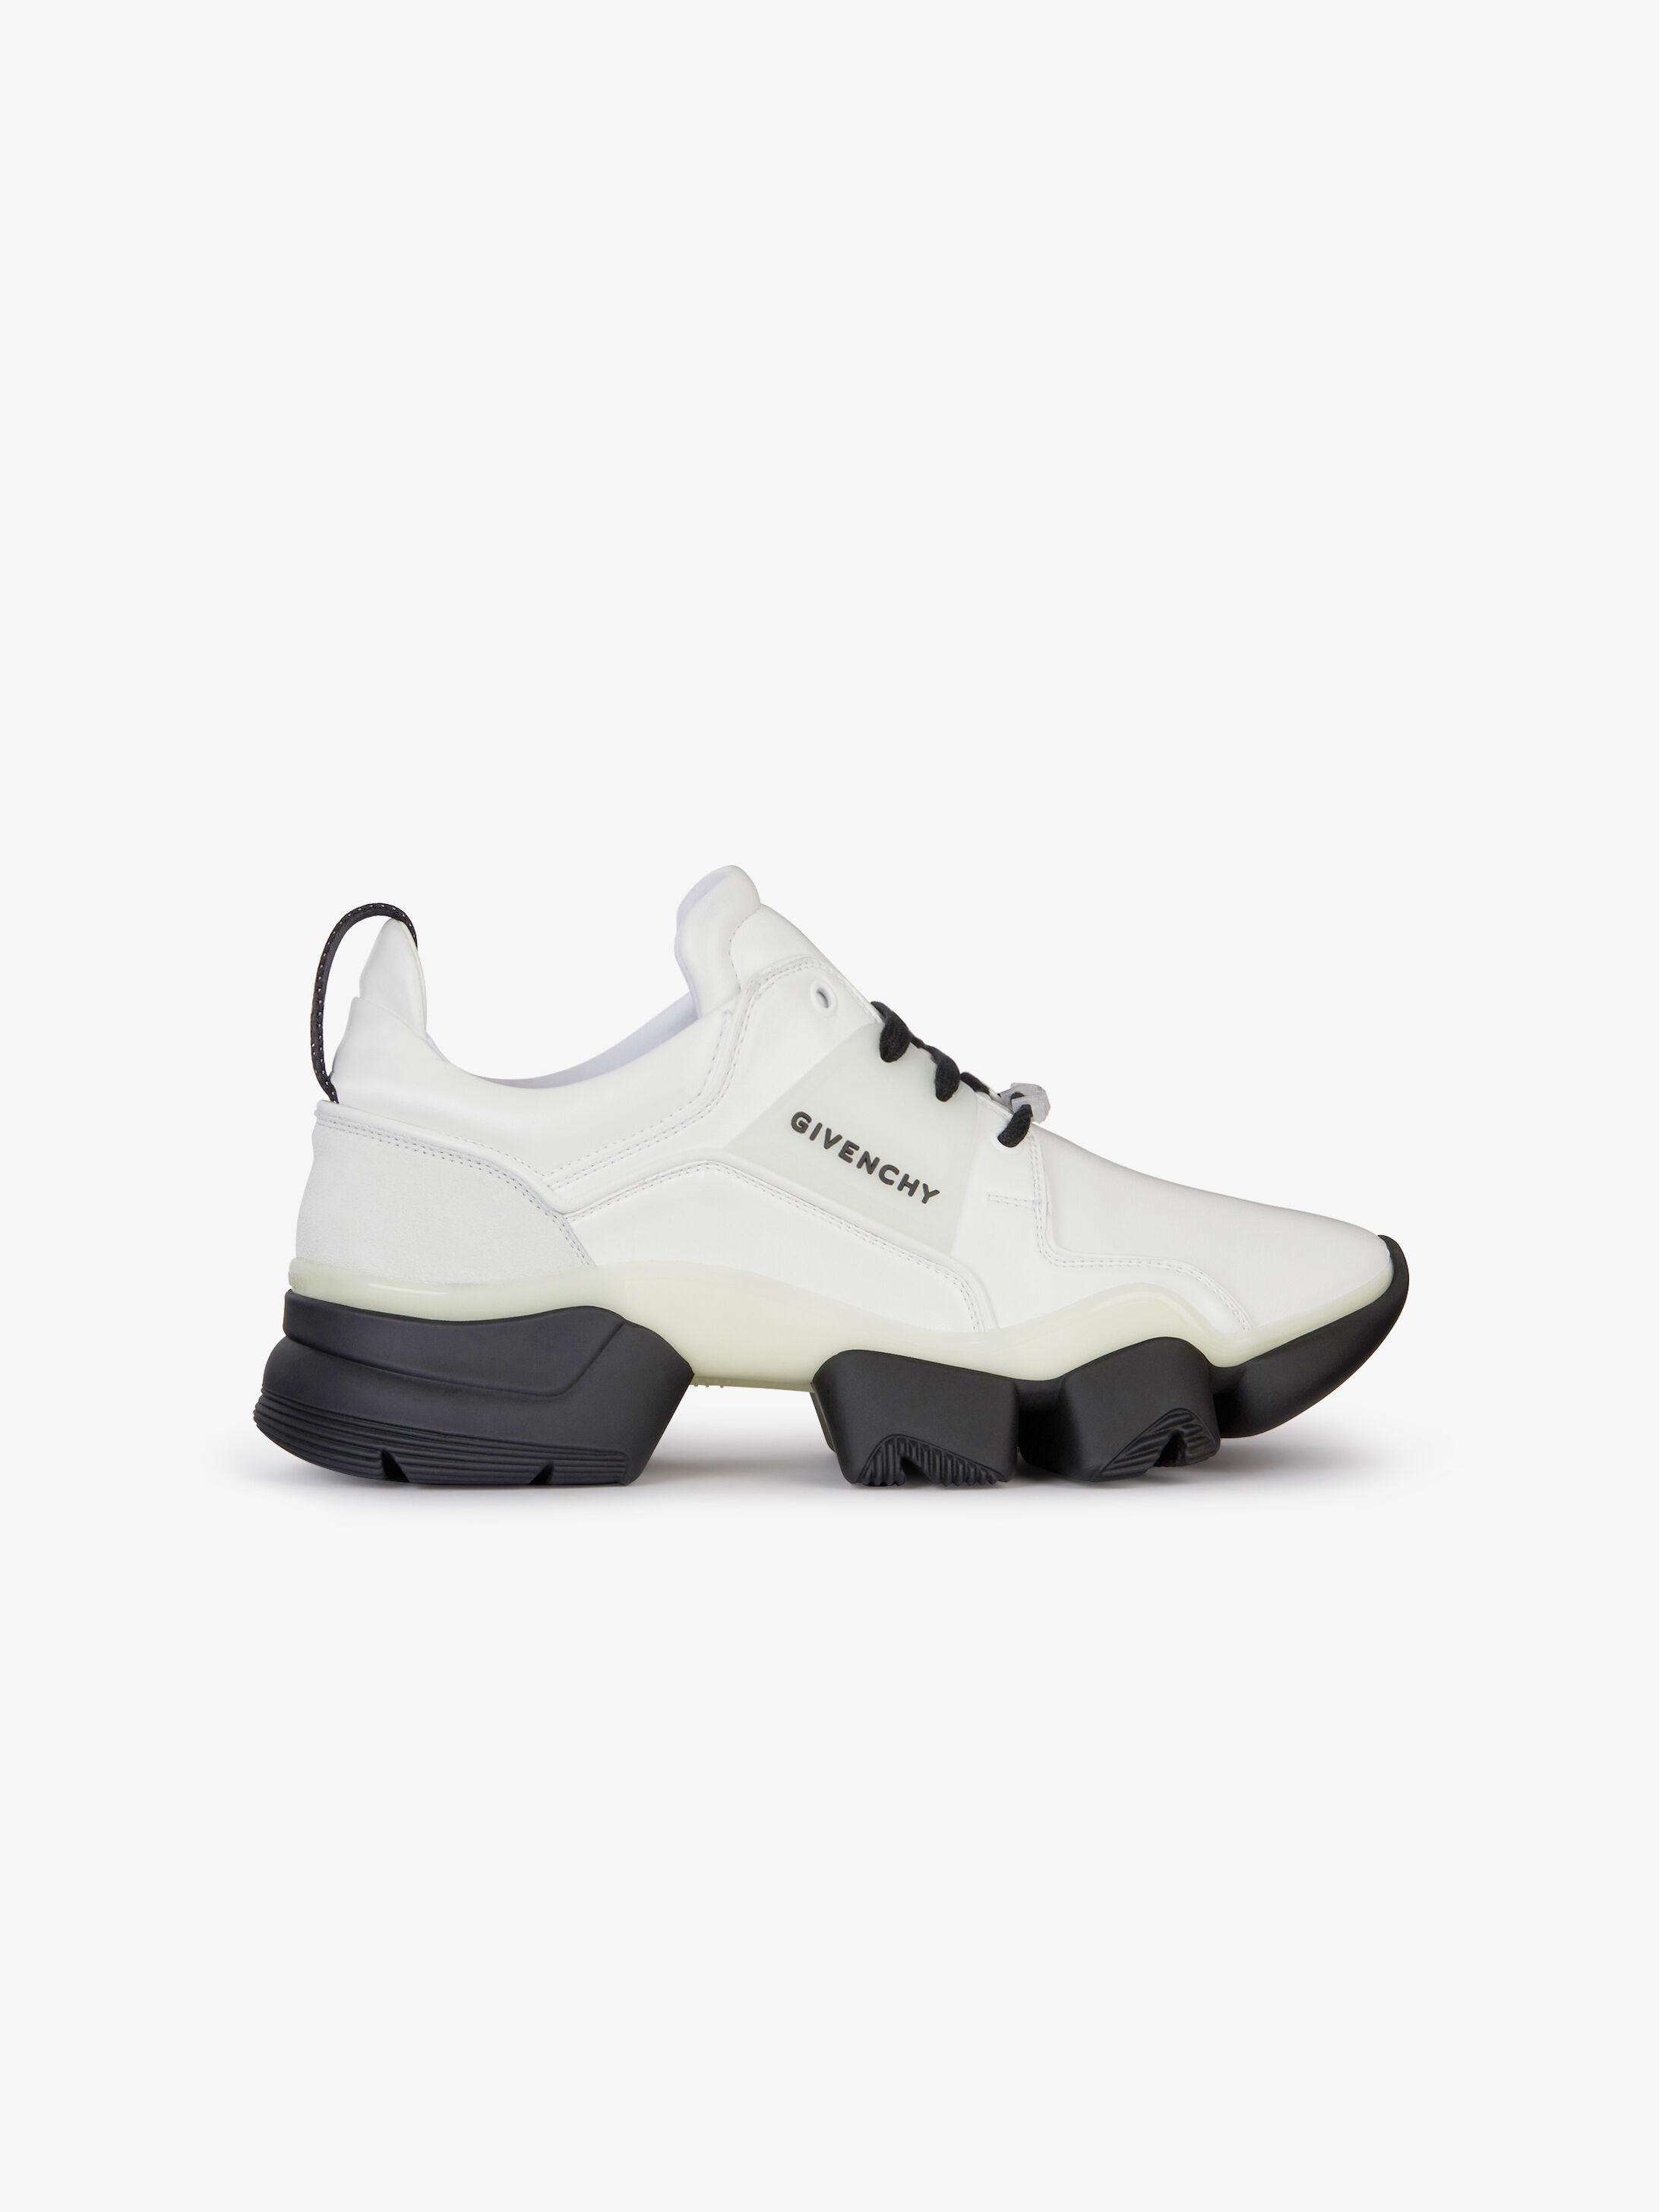 Givenchy Sneakers basses en cuir perforé Rouge | Homme Sneakers